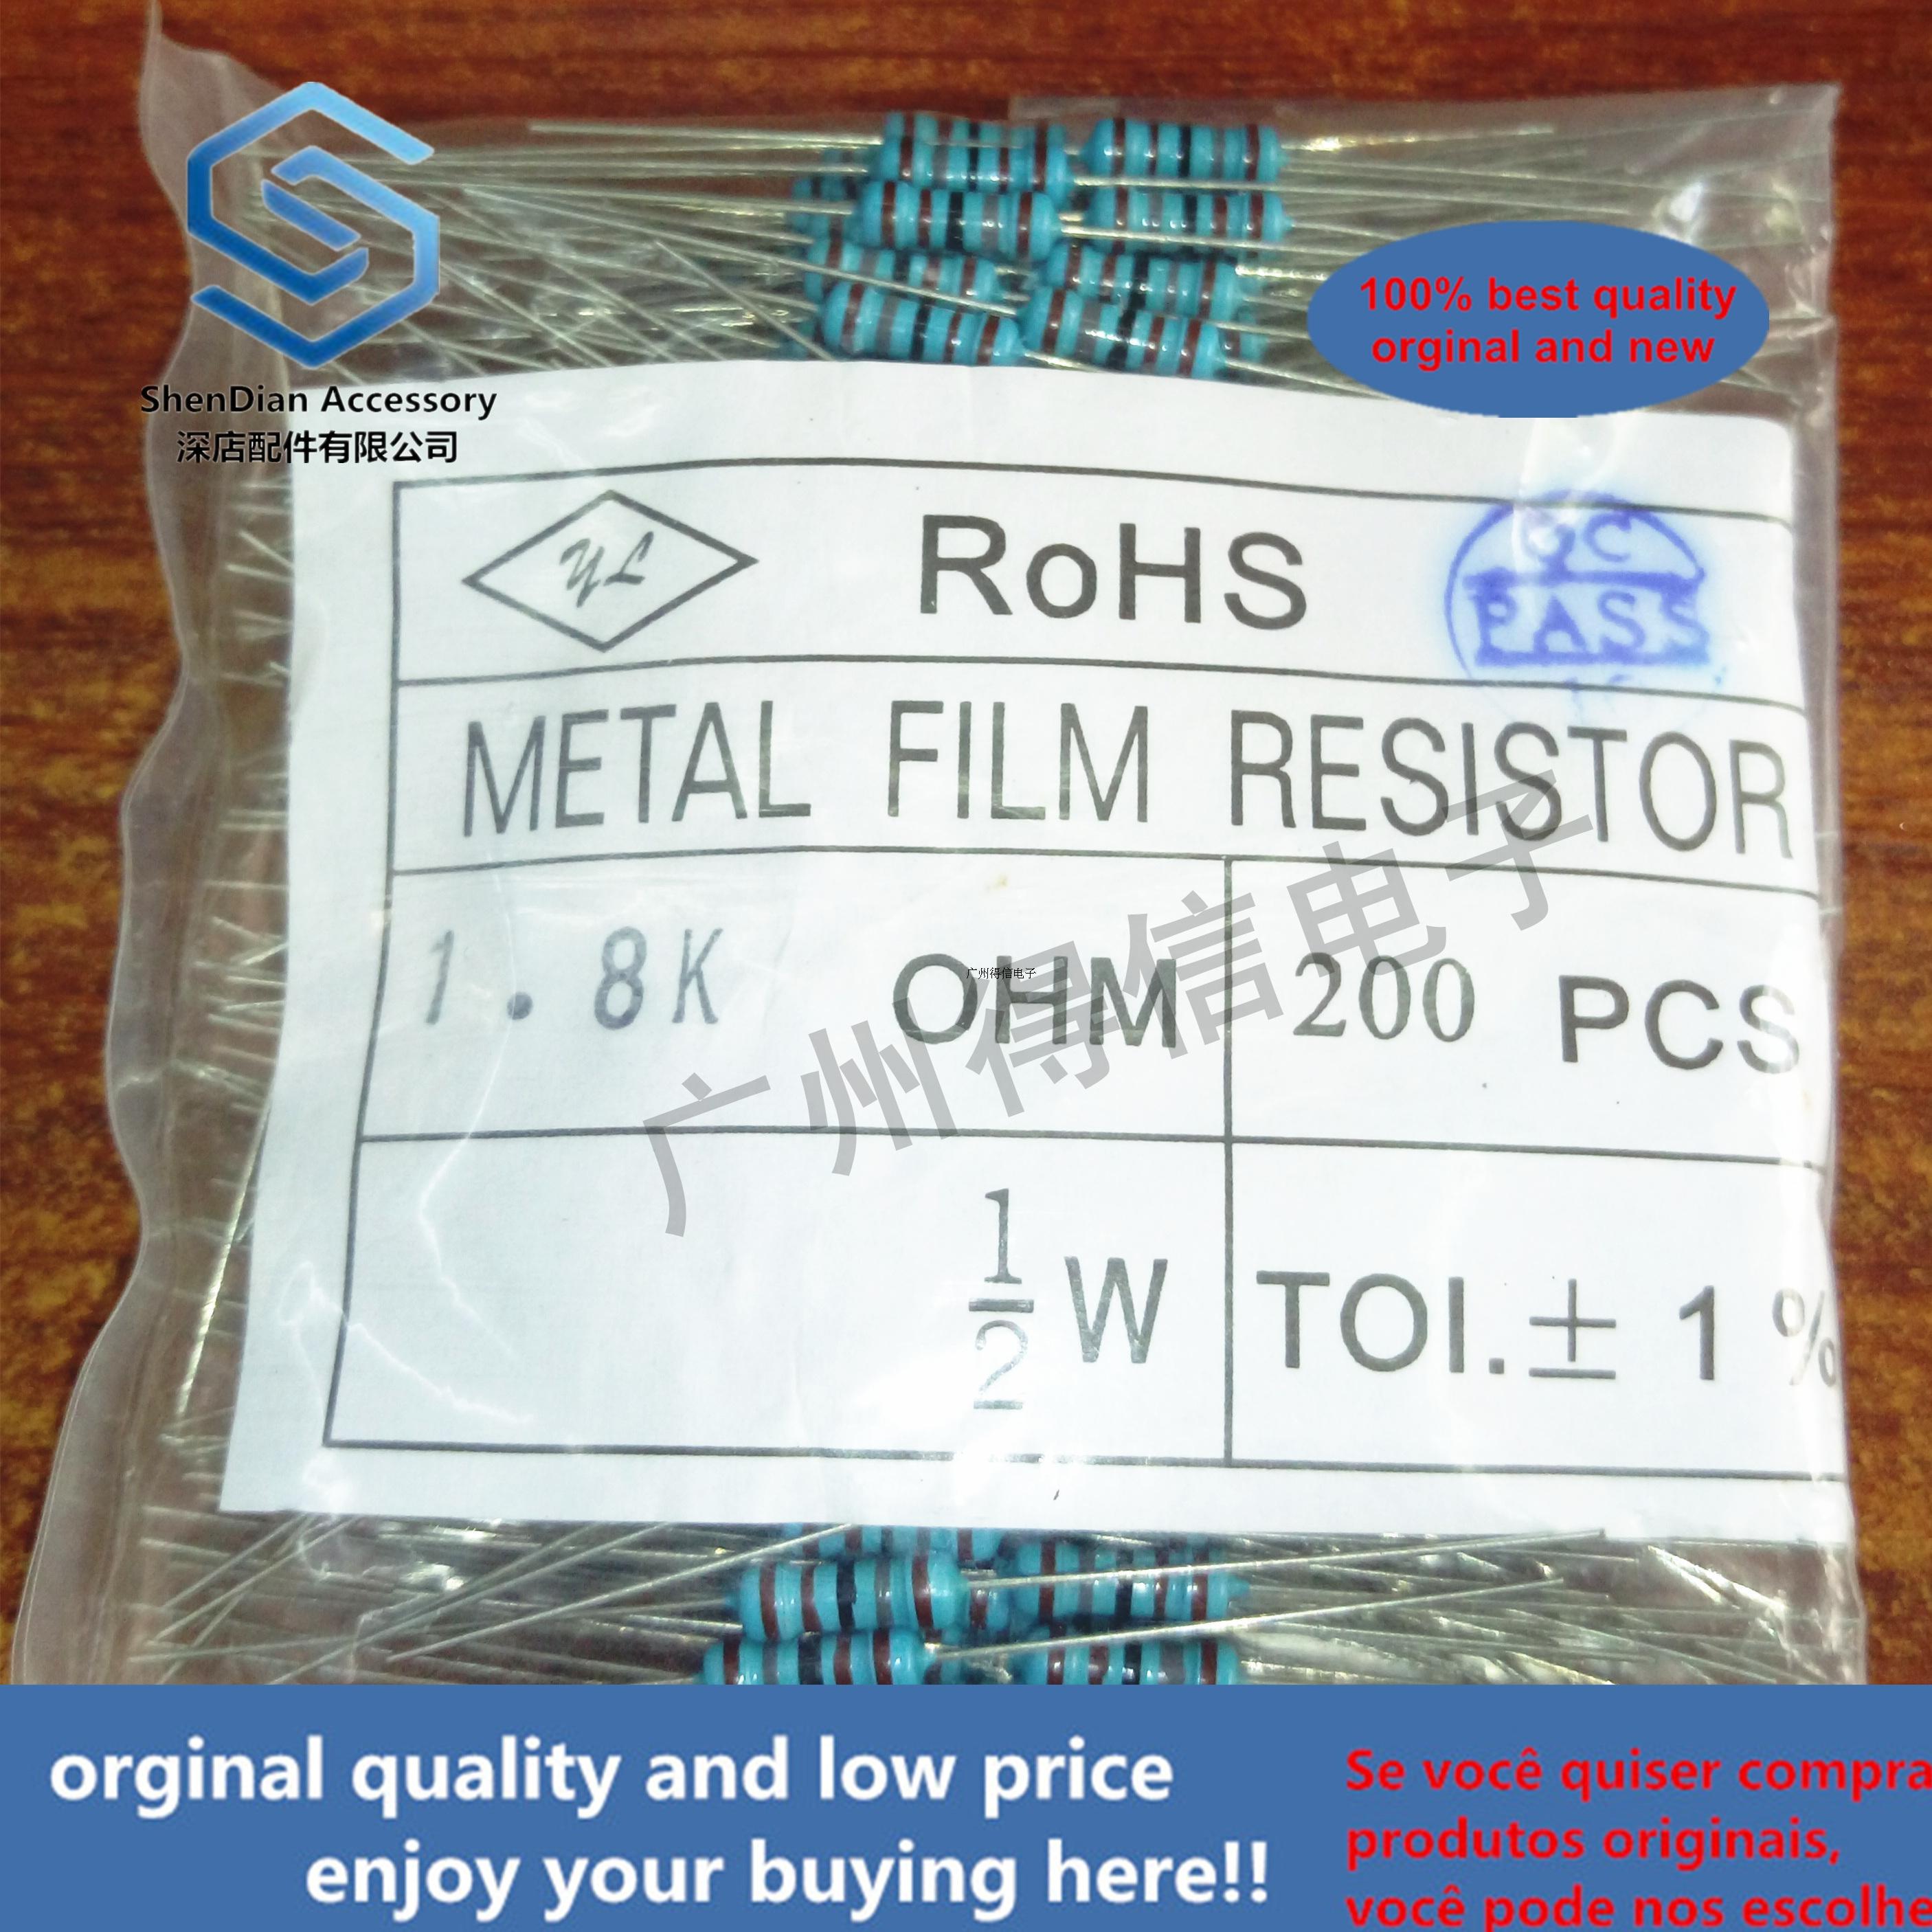 200pcs 1 / 2W 43R 43Euro 1% Brand New Metal Film Iron Feet Resistance Bag 200pcs Per Pack